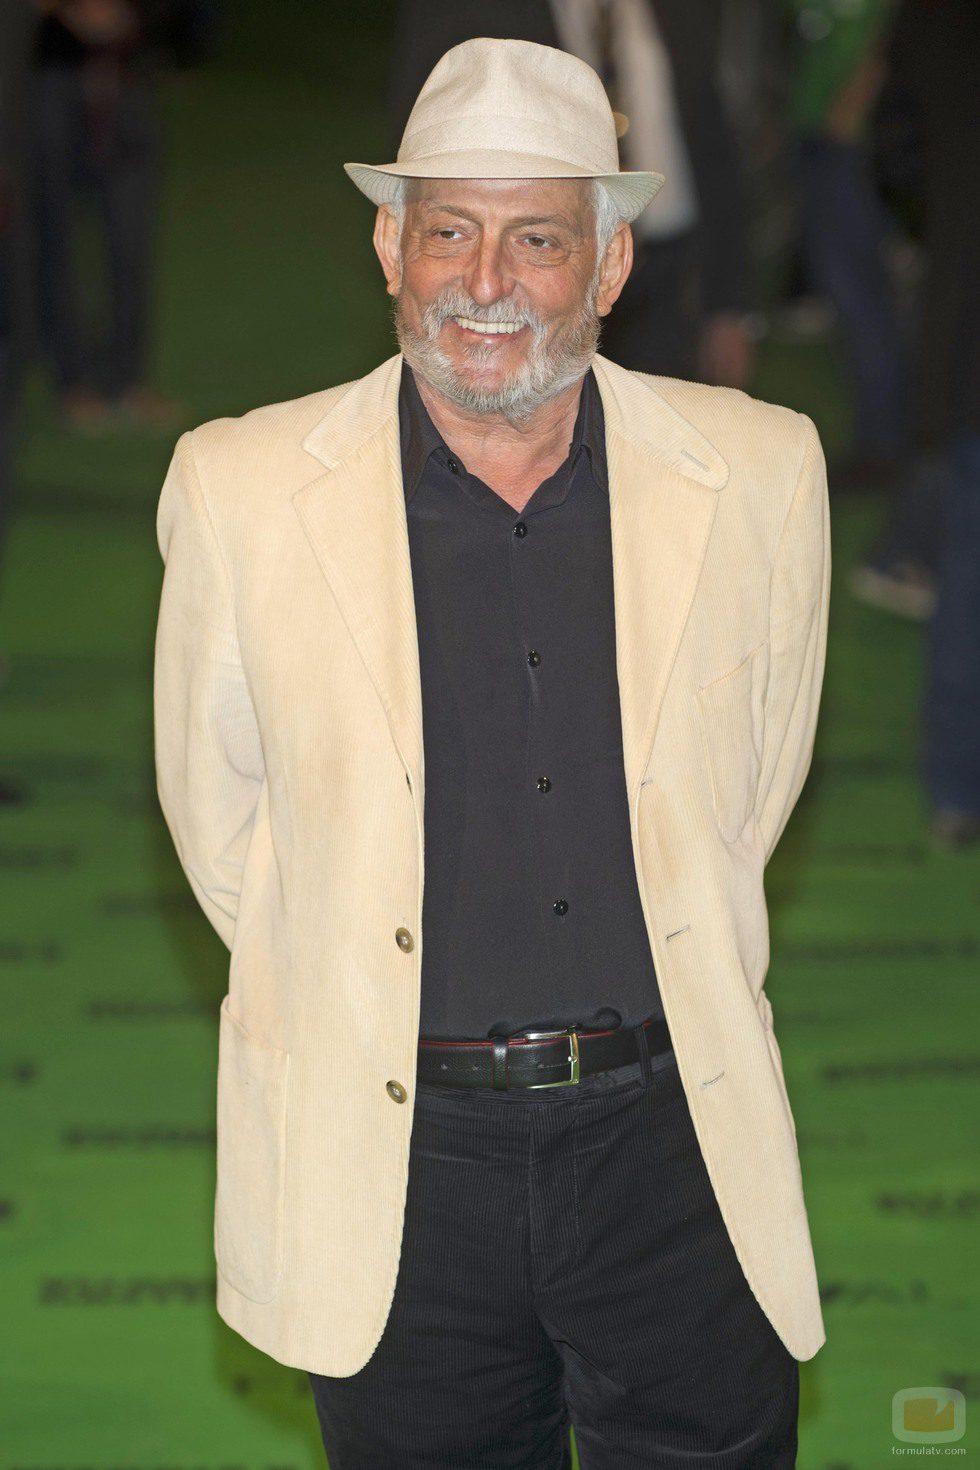 Pepe Sancho, en la alfombra verde del FesTVal de Vitoria